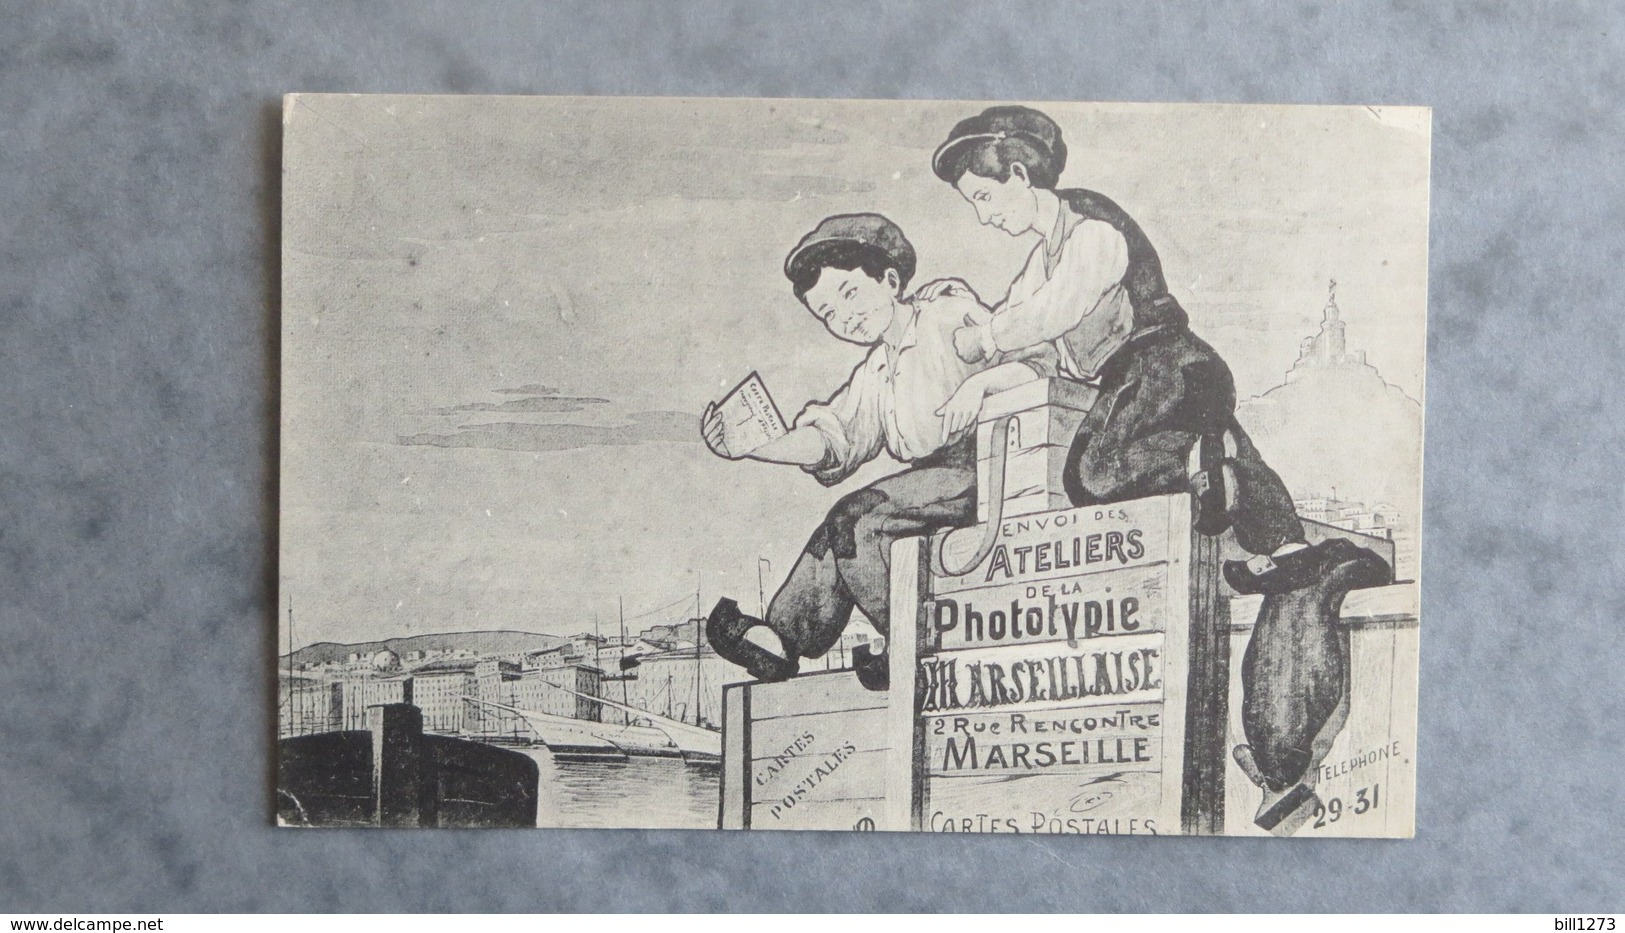 CPA-13-Ateliers De La Phototypie Marseillaise, 2 Rue Rencontre, MARSEILLE-Cartes Postales - Marseilles